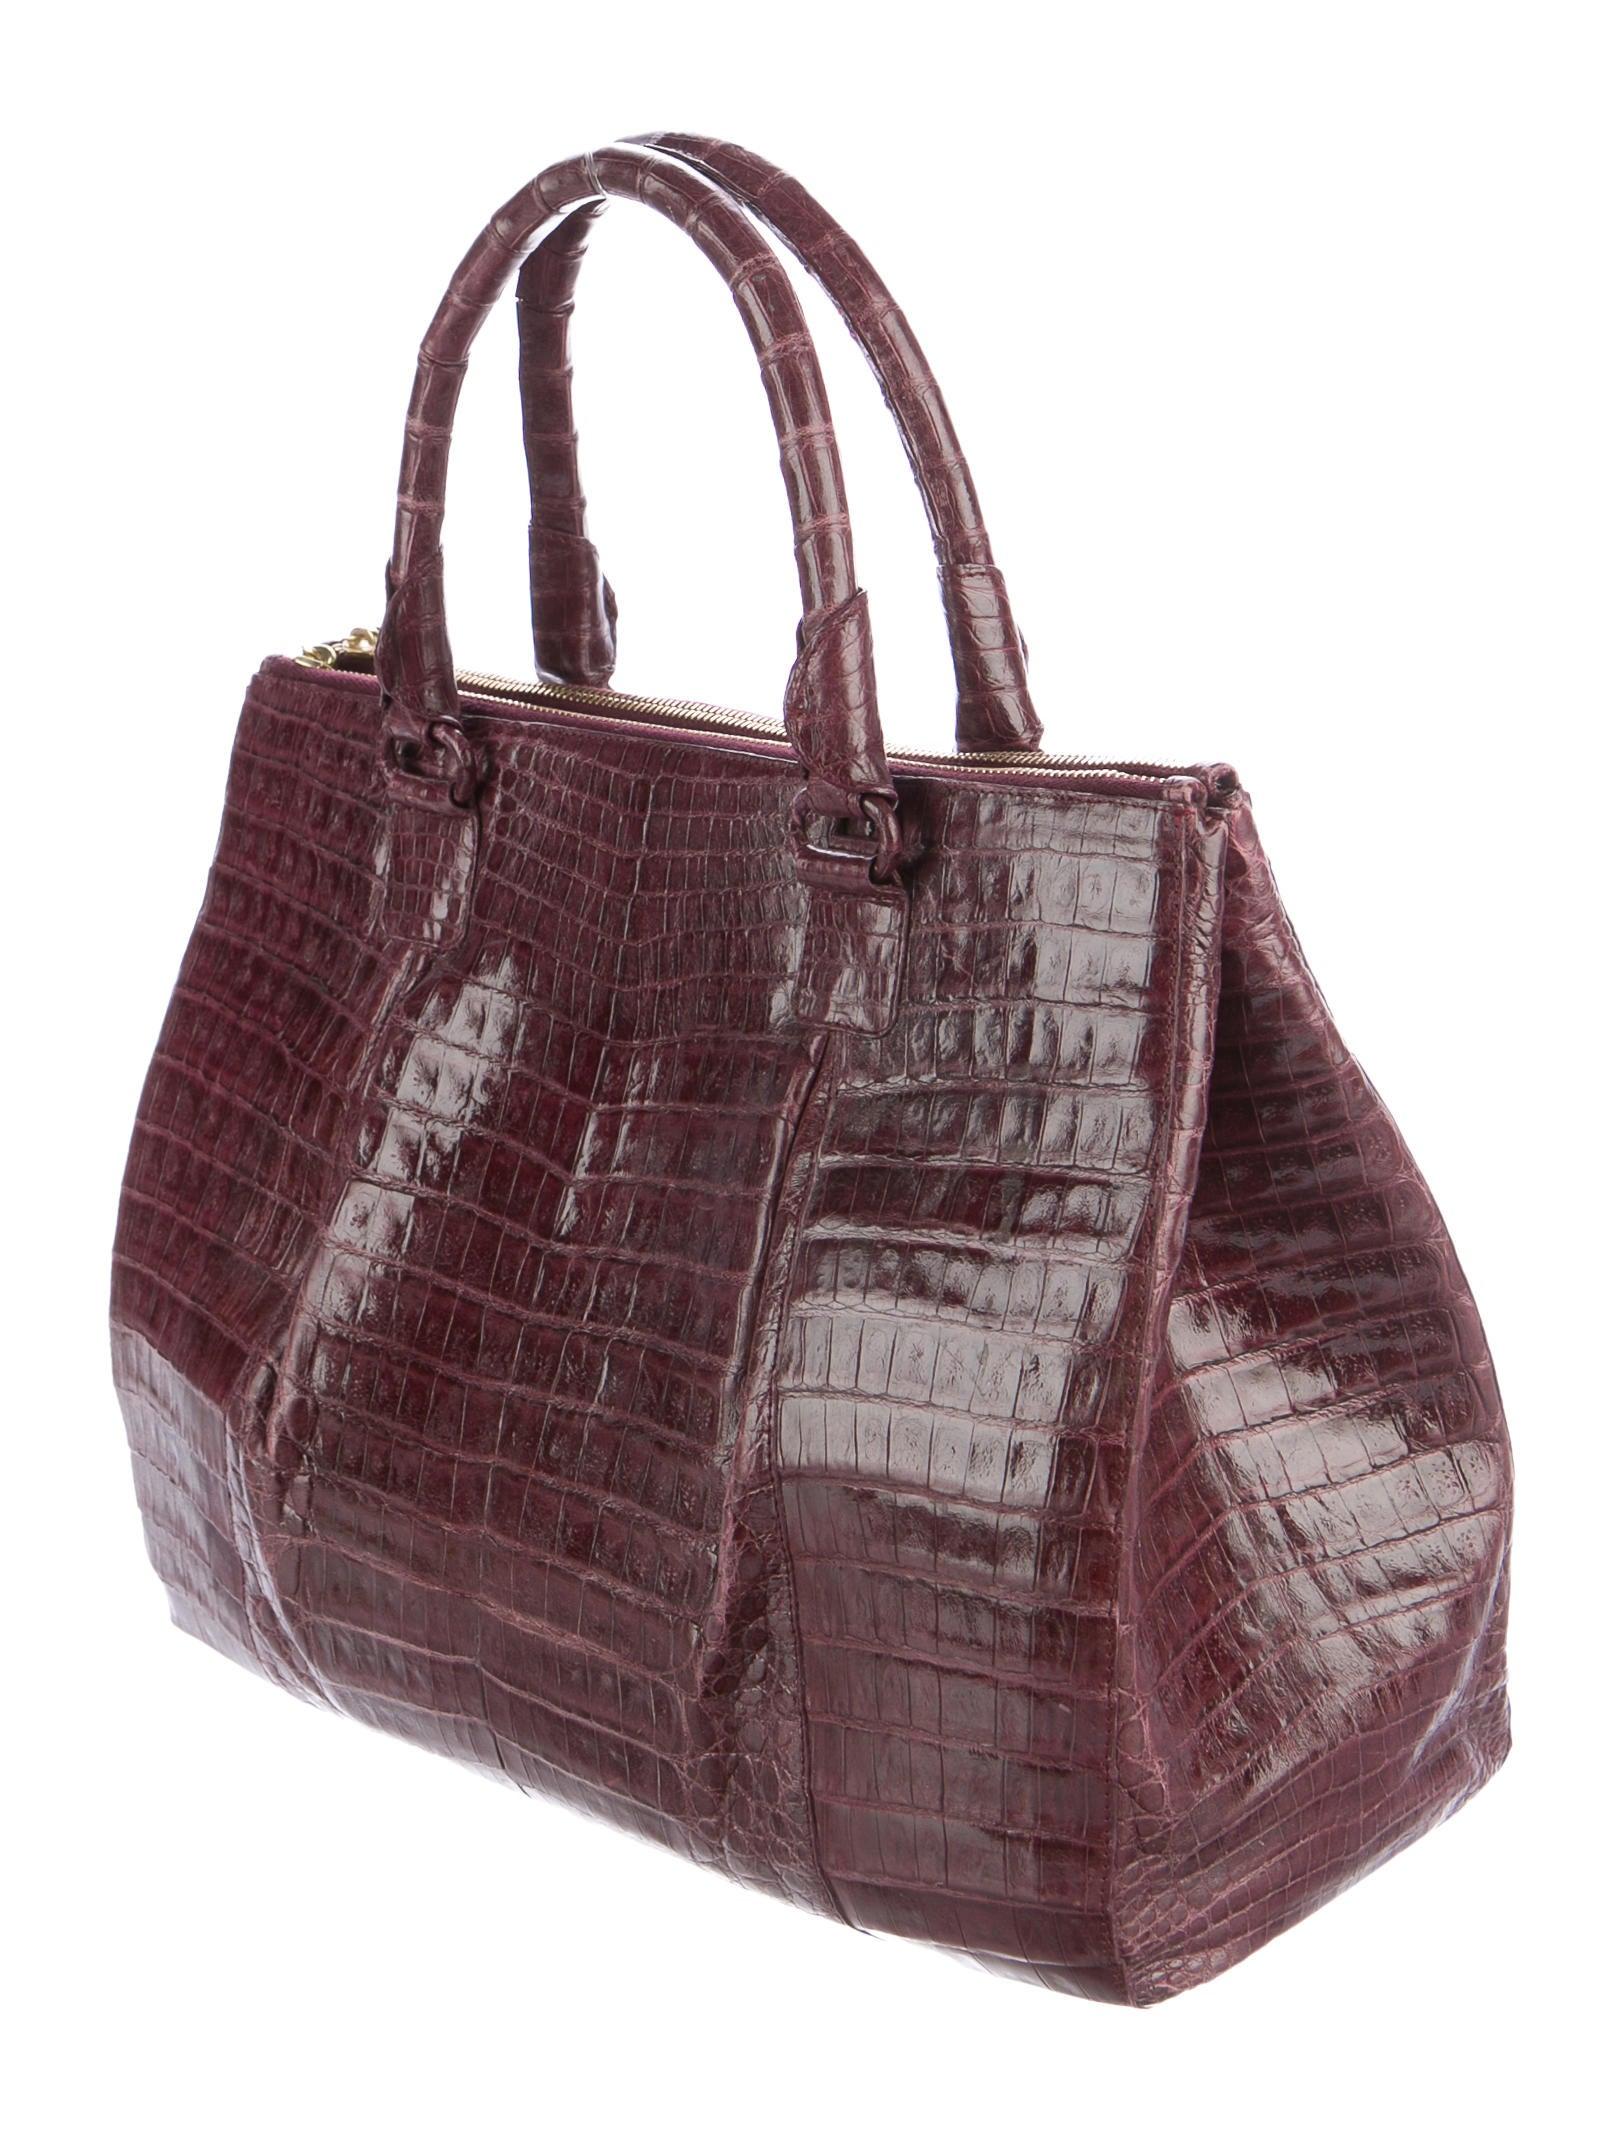 Nancy gonzalez crocodile double zip tote handbags for Nancy gonzalez crocodile tote